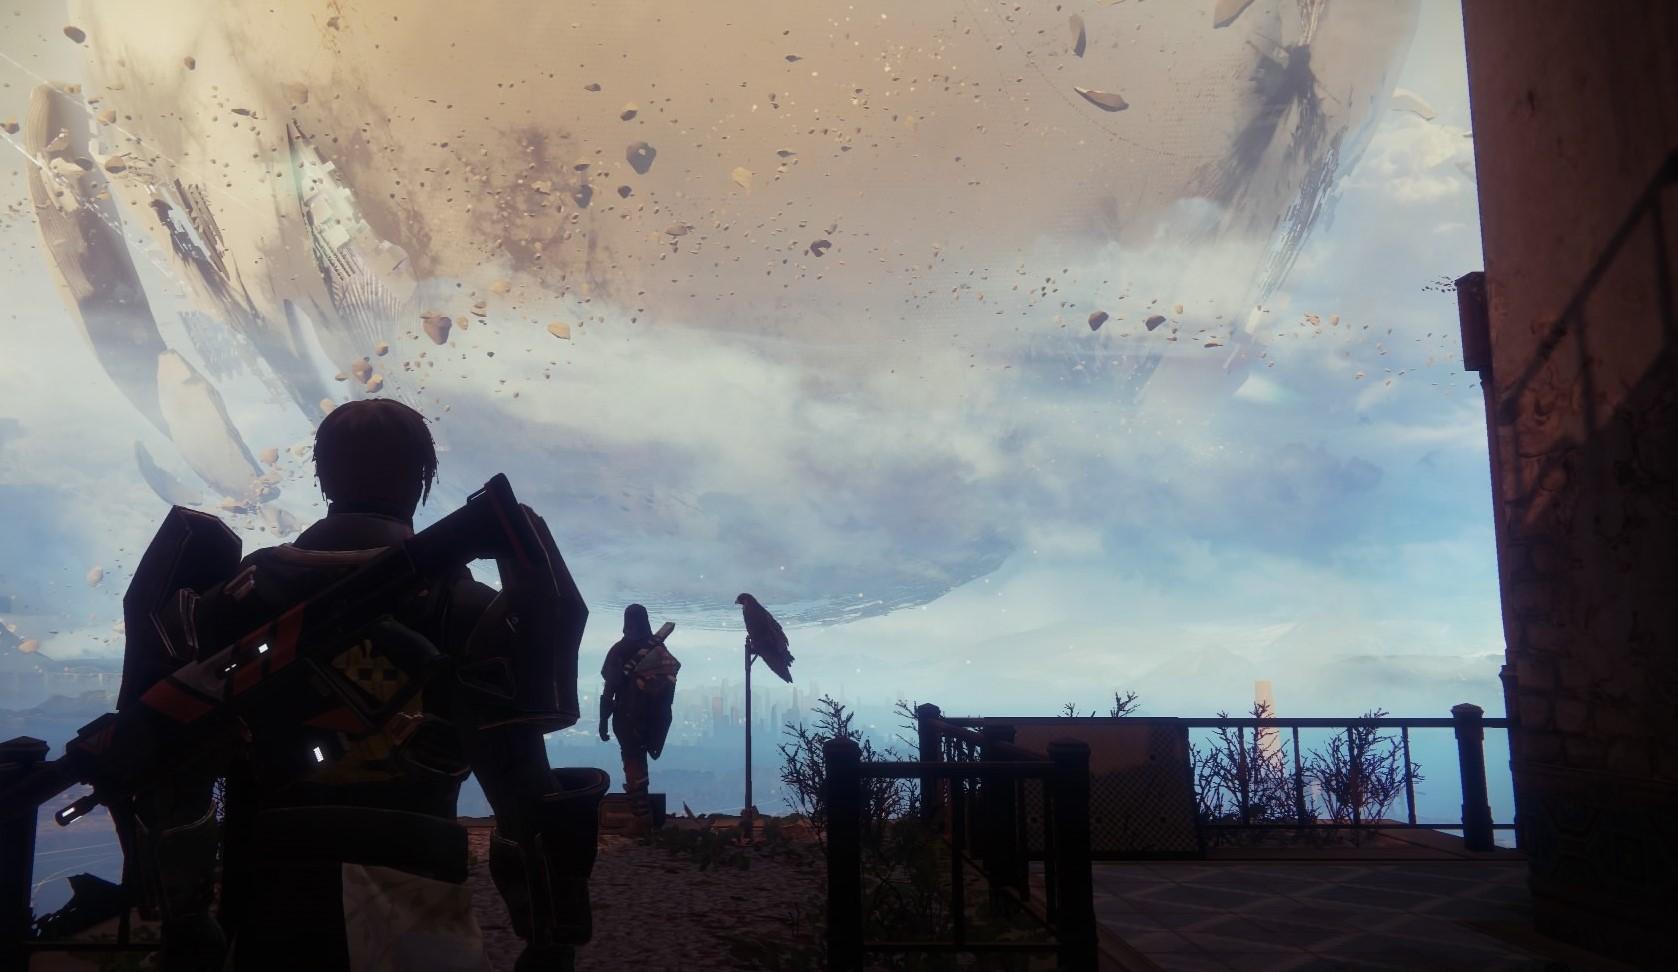 Destiny 2 Update 1.03: Patch-Notes – Guide-Spiele-Beta aktiv, Hasssymbol entfernt